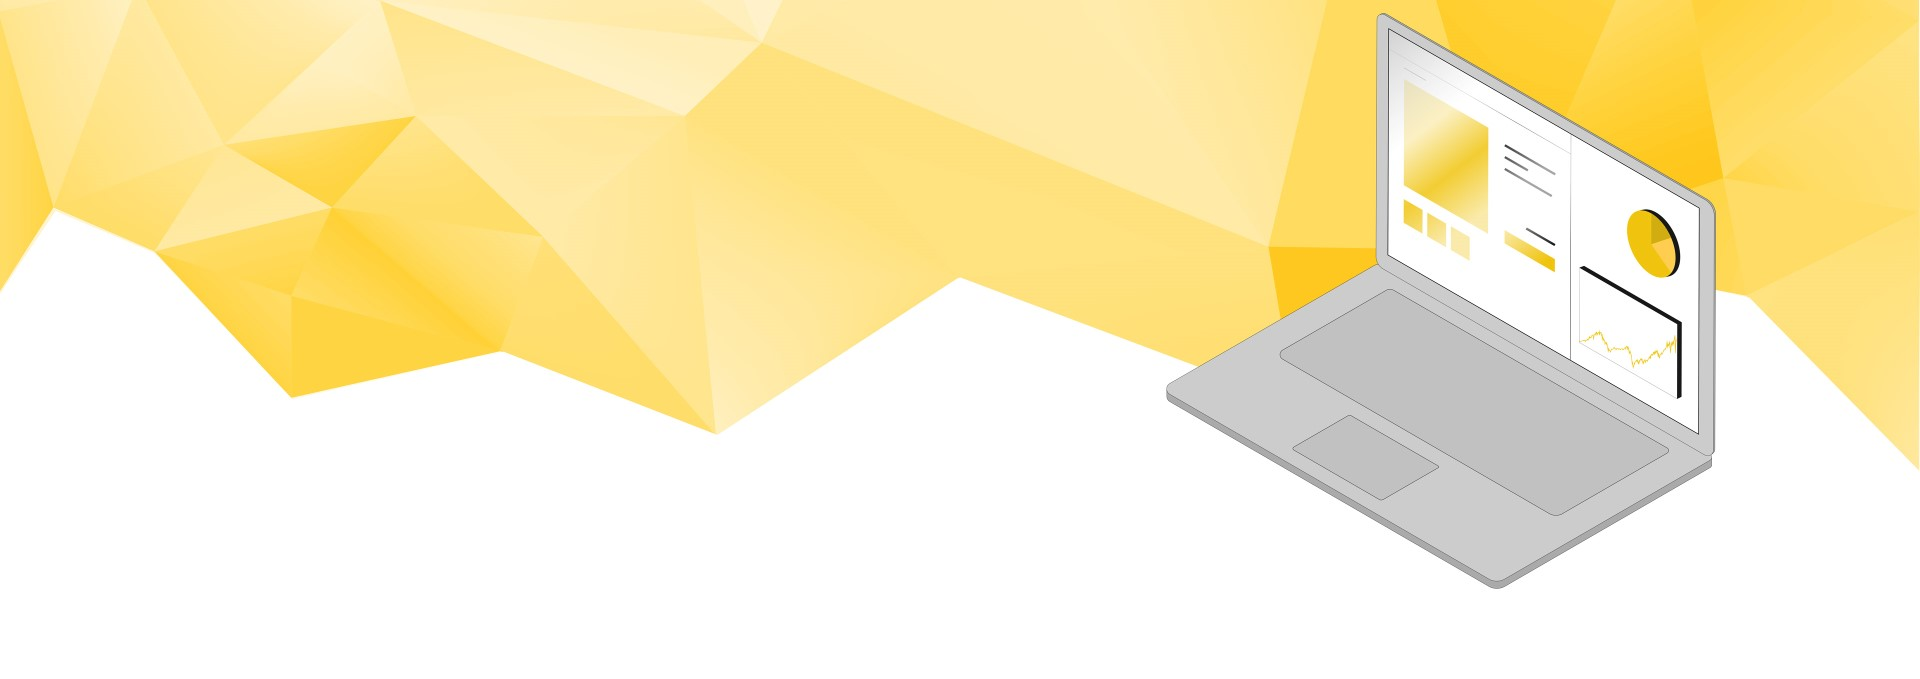 EXWE Grafik Laptop E-Commerce Agentur